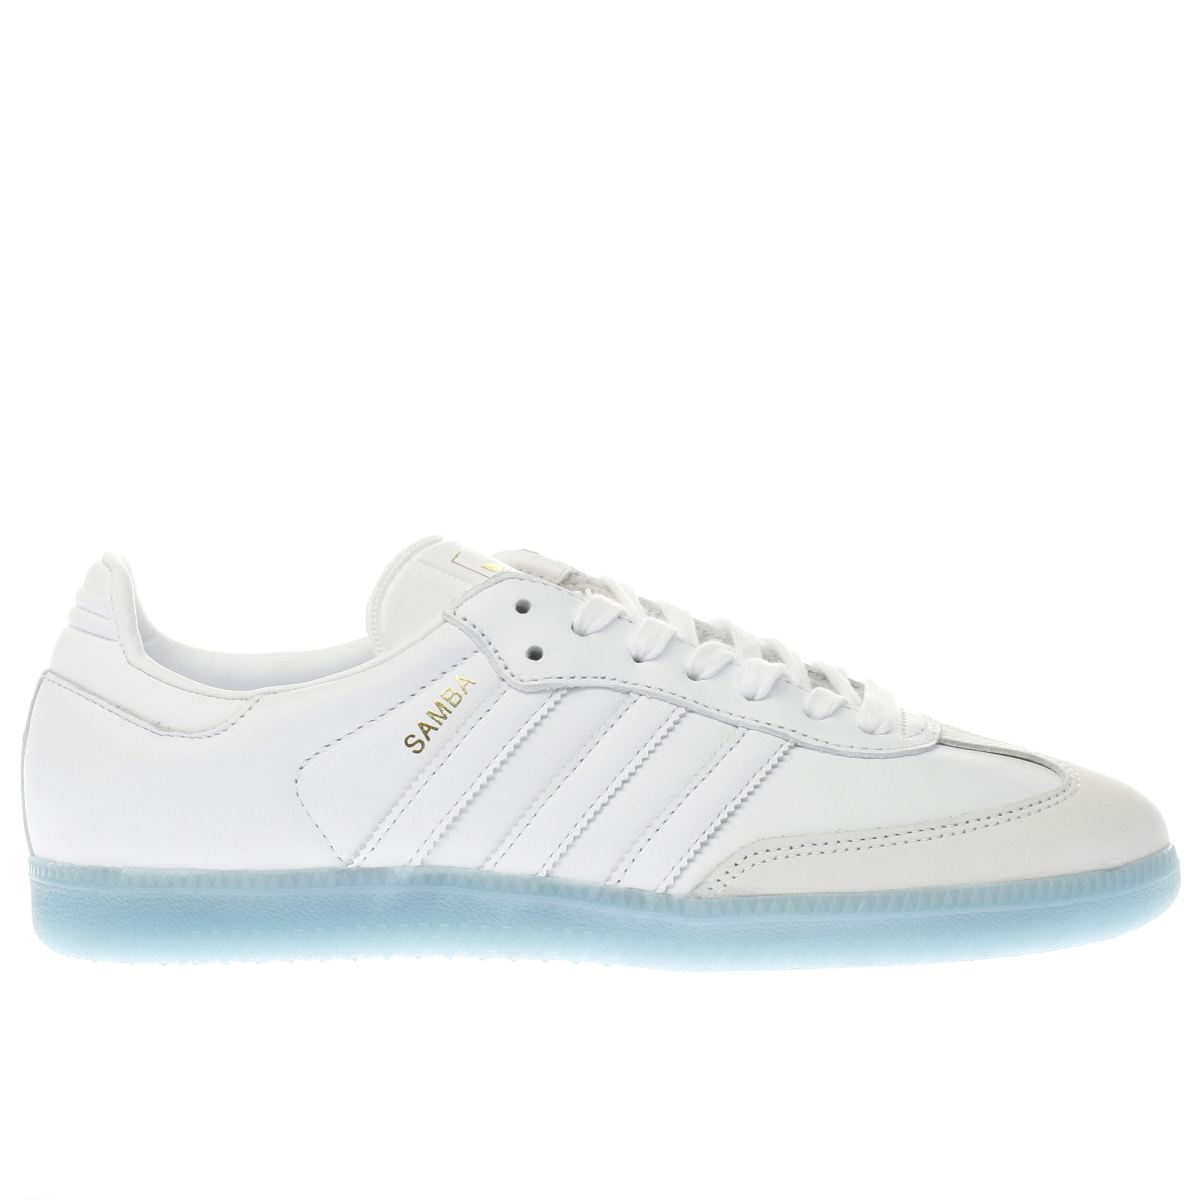 adidas white & pl blue samba trainers